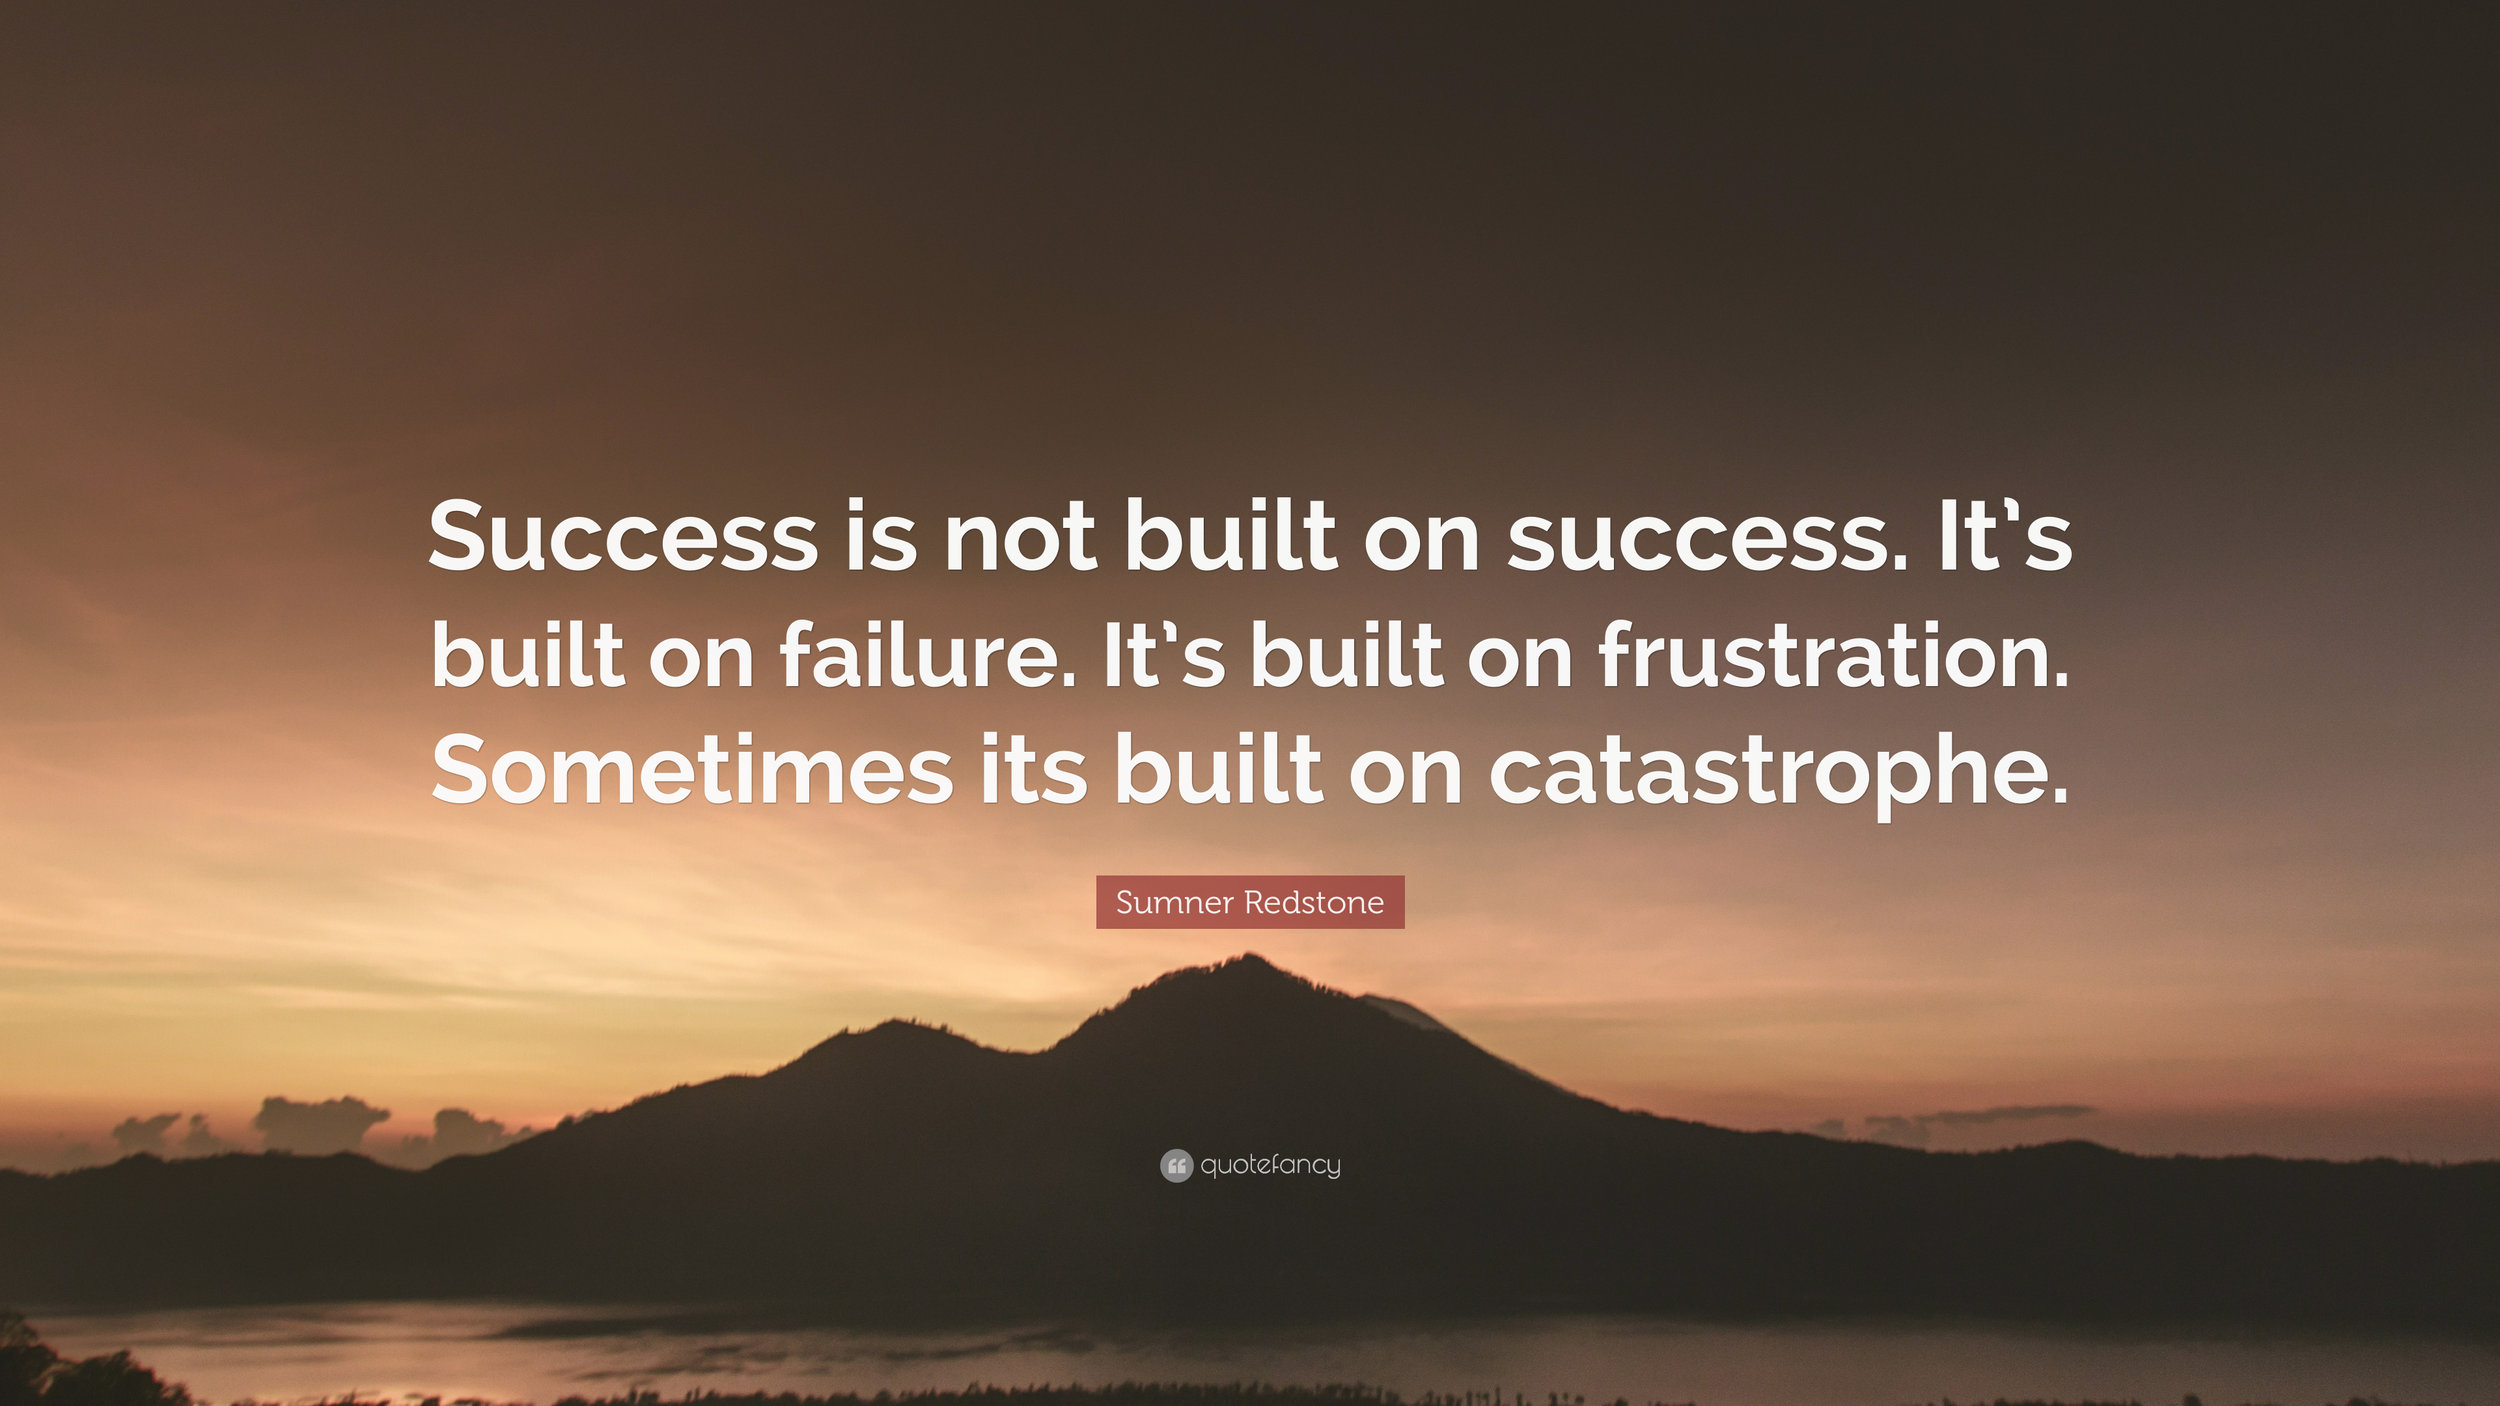 2193327-Sumner-Redstone-Quote-Success-is-not-built-on-success-It-s-built.jpg